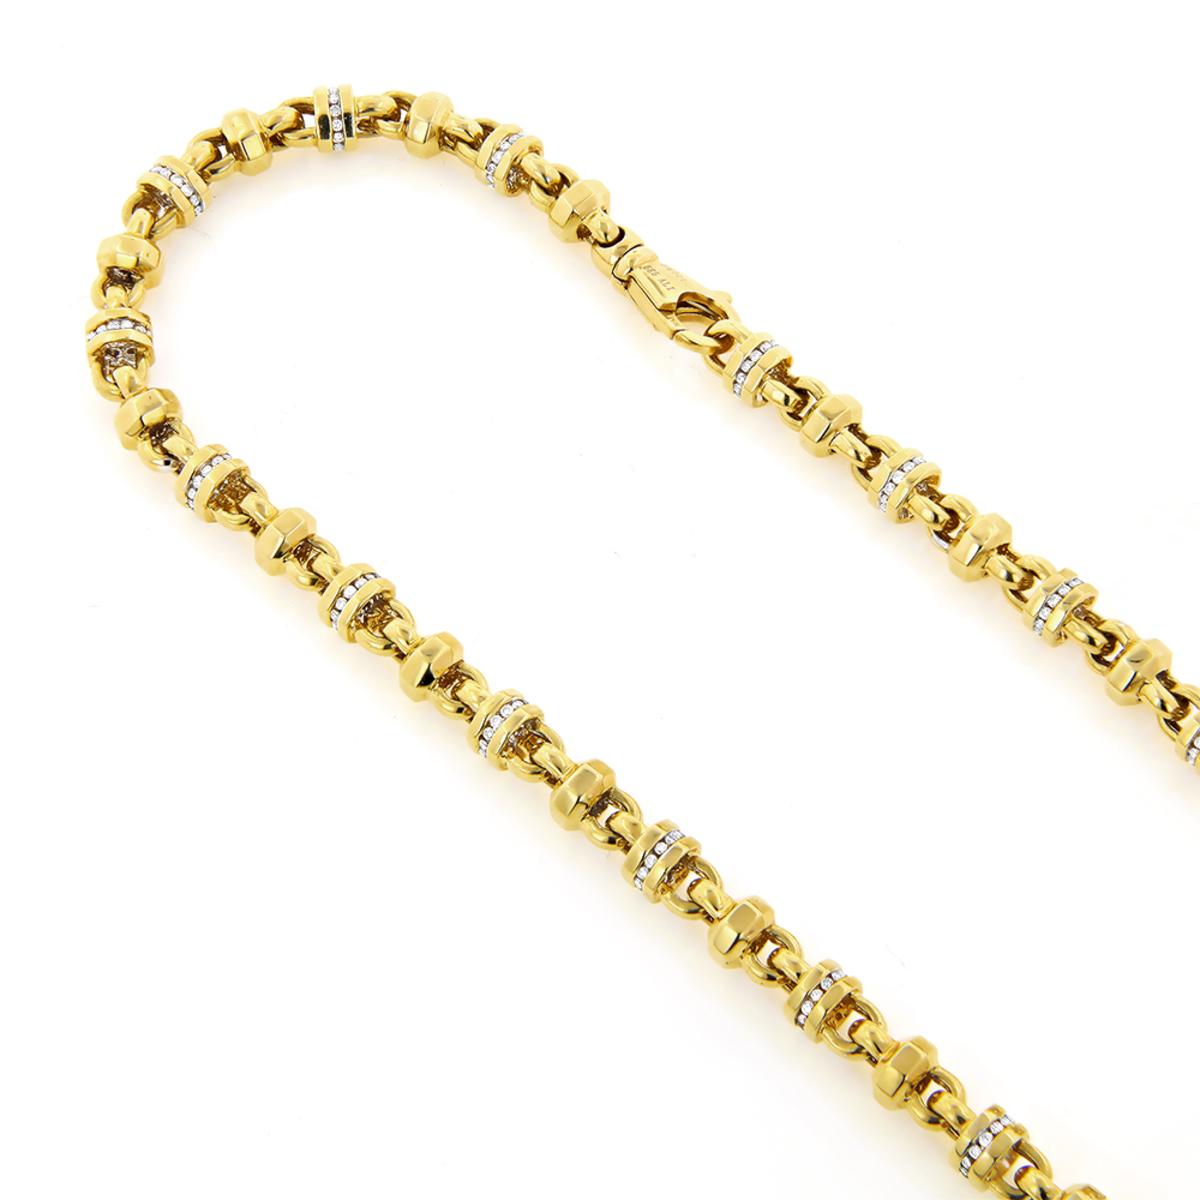 Diamond Chains: 14K Gold Diamond Necklace 4.15ct